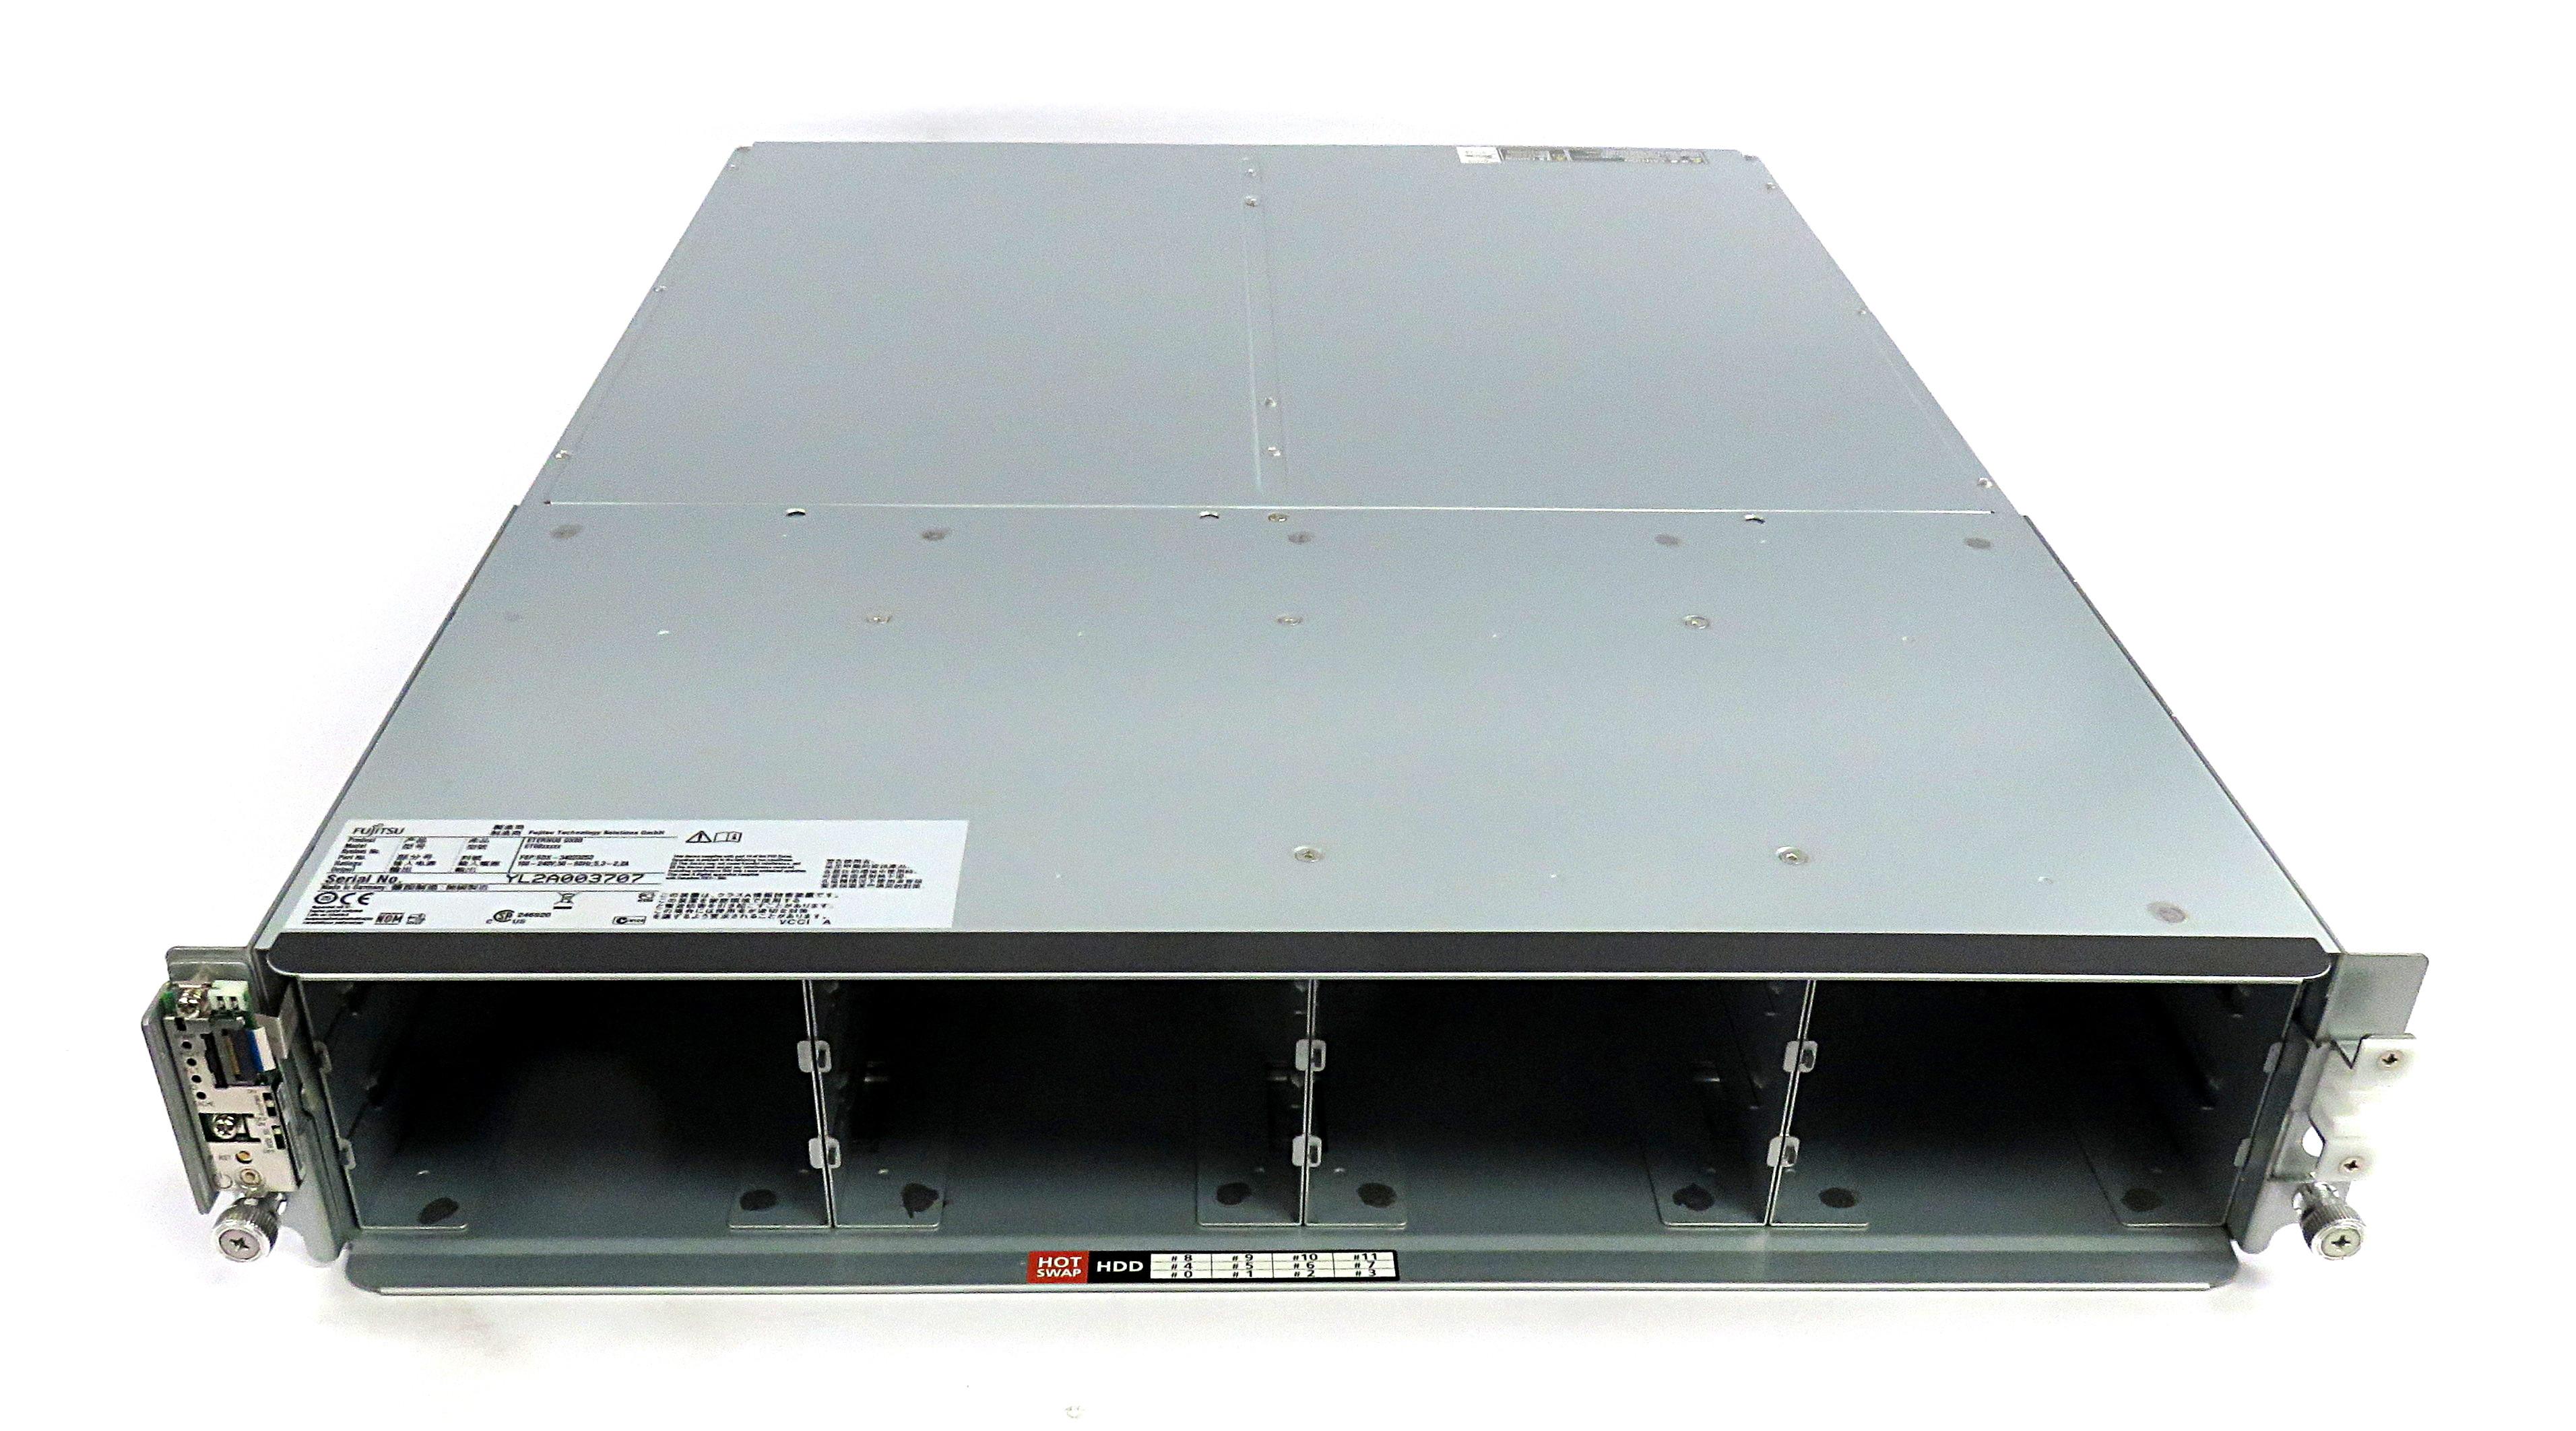 "Fujitsu SDX-34023253 Eternus DX80 12x 3.5"" SAS/SATA Disk Enclosure w/ Dual PSUs"